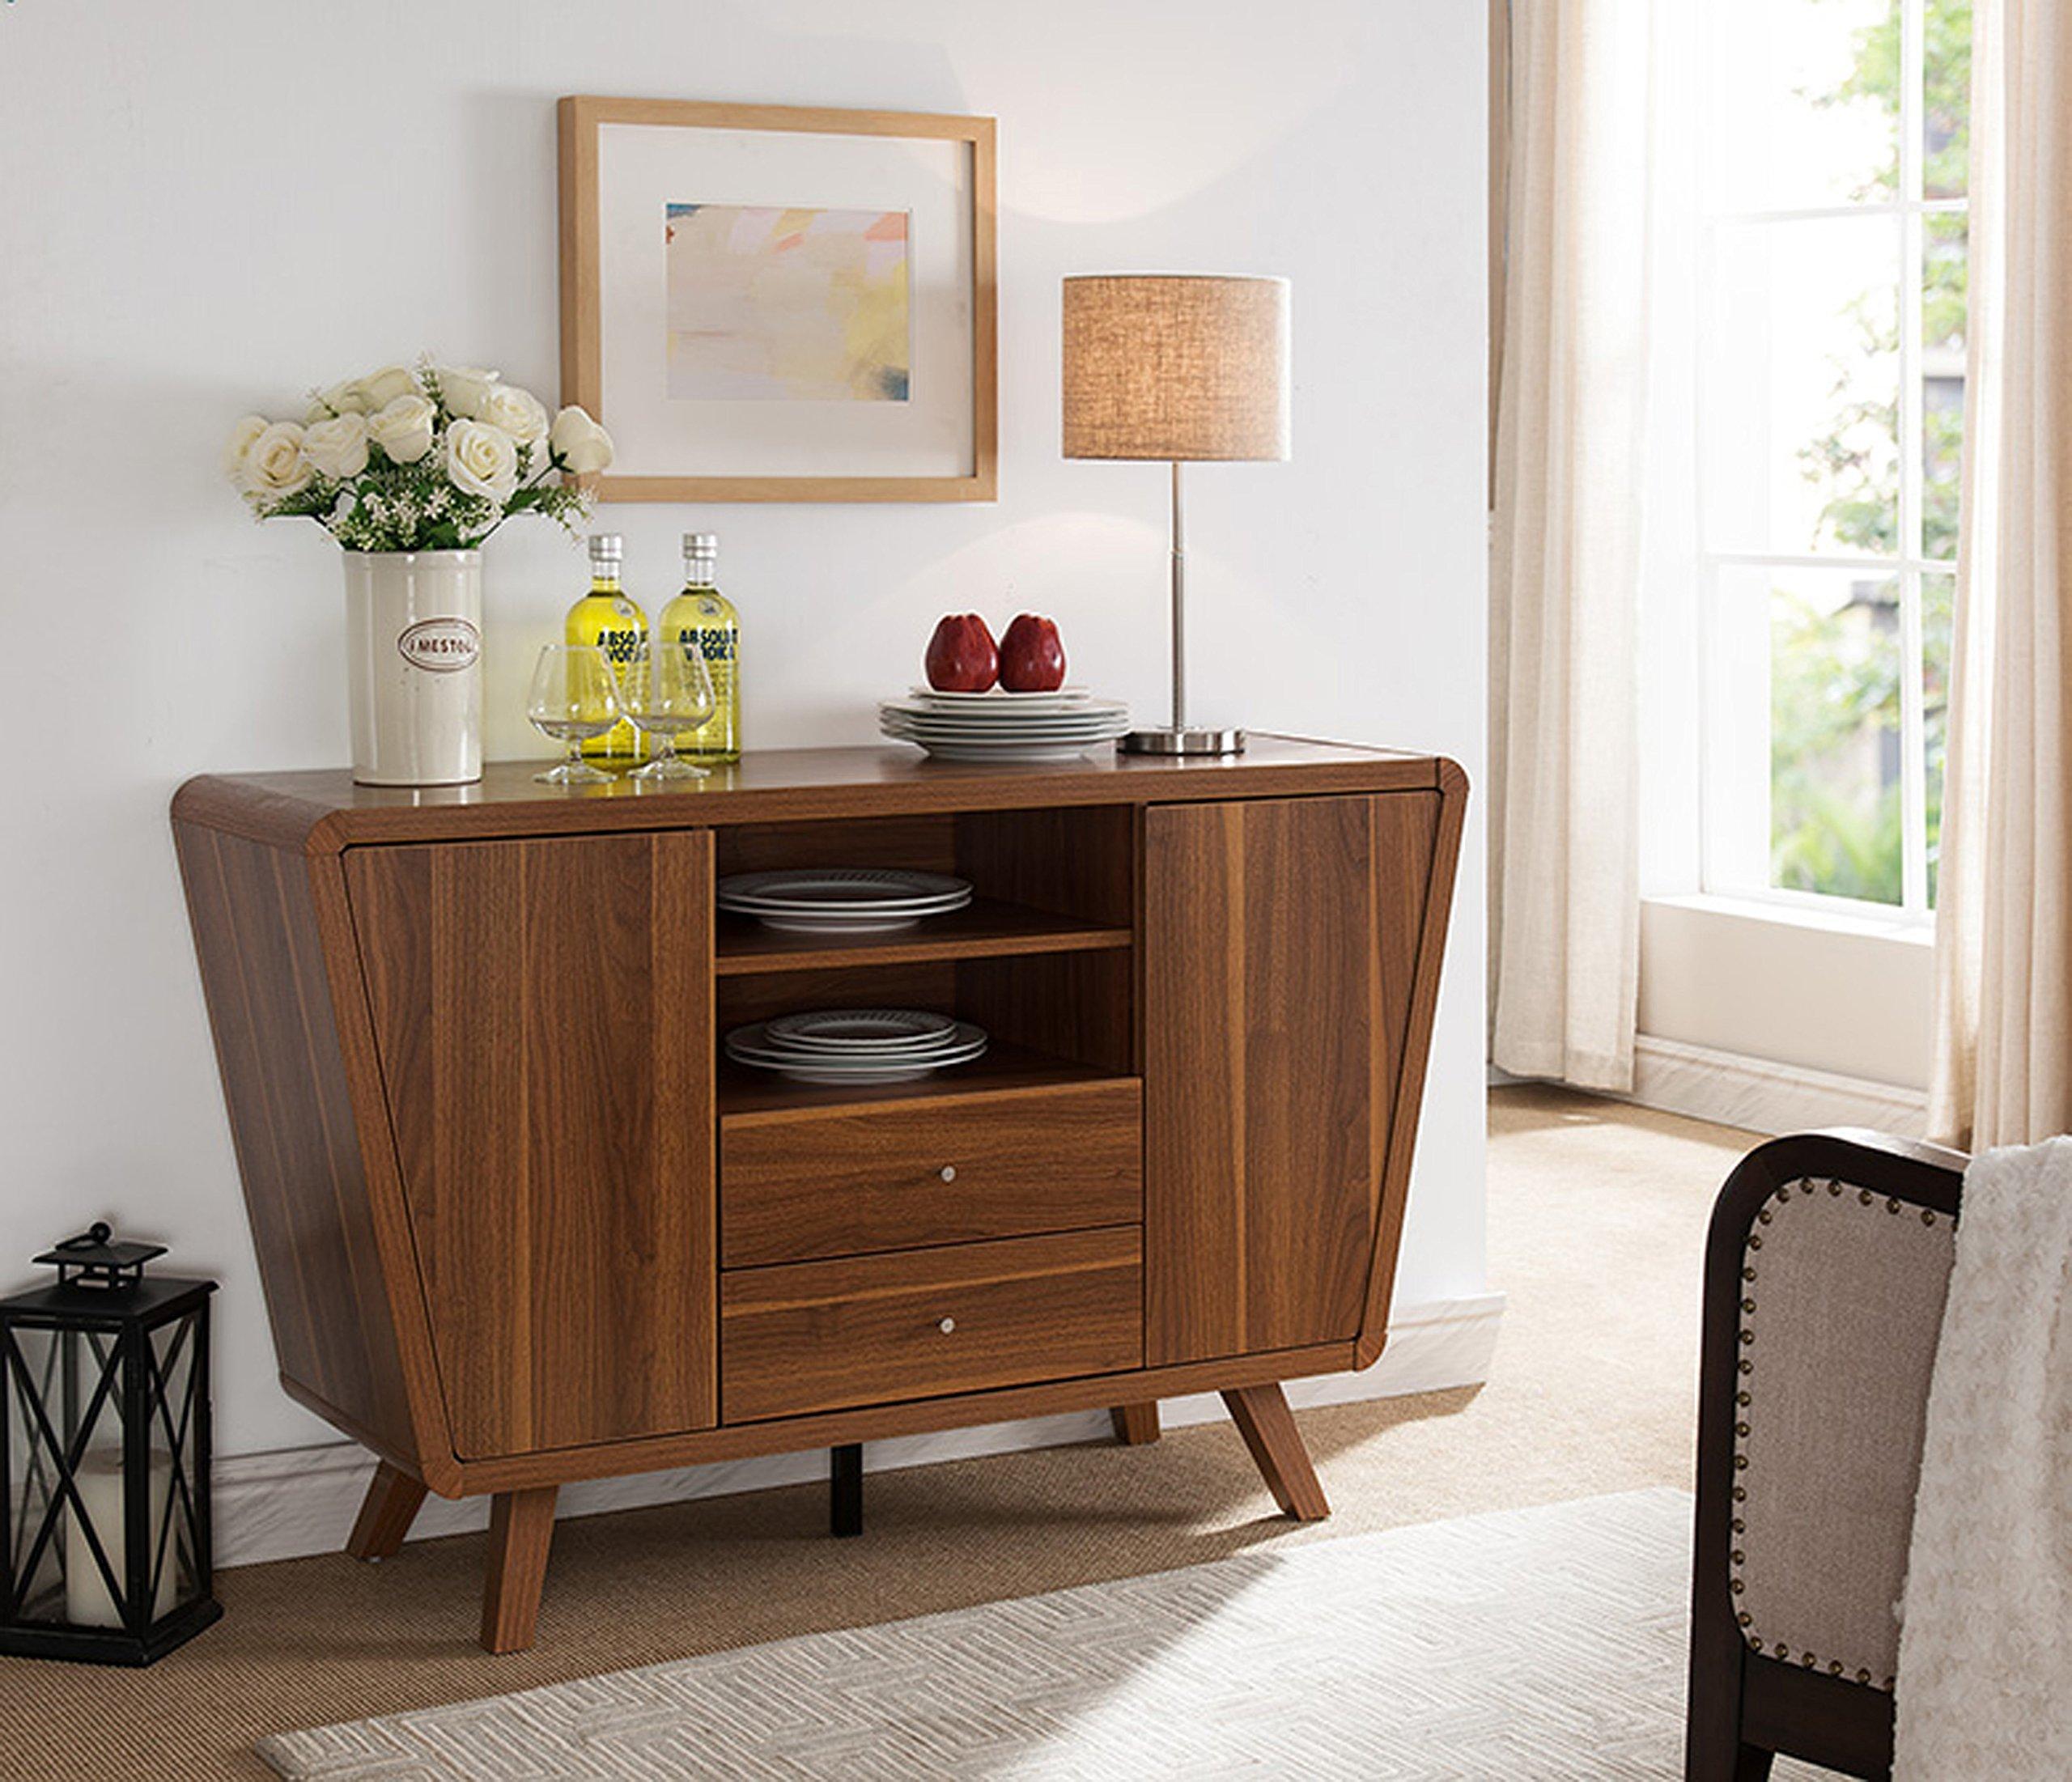 Smart Home 151378 Light Walnut Sideboard Buffet Table